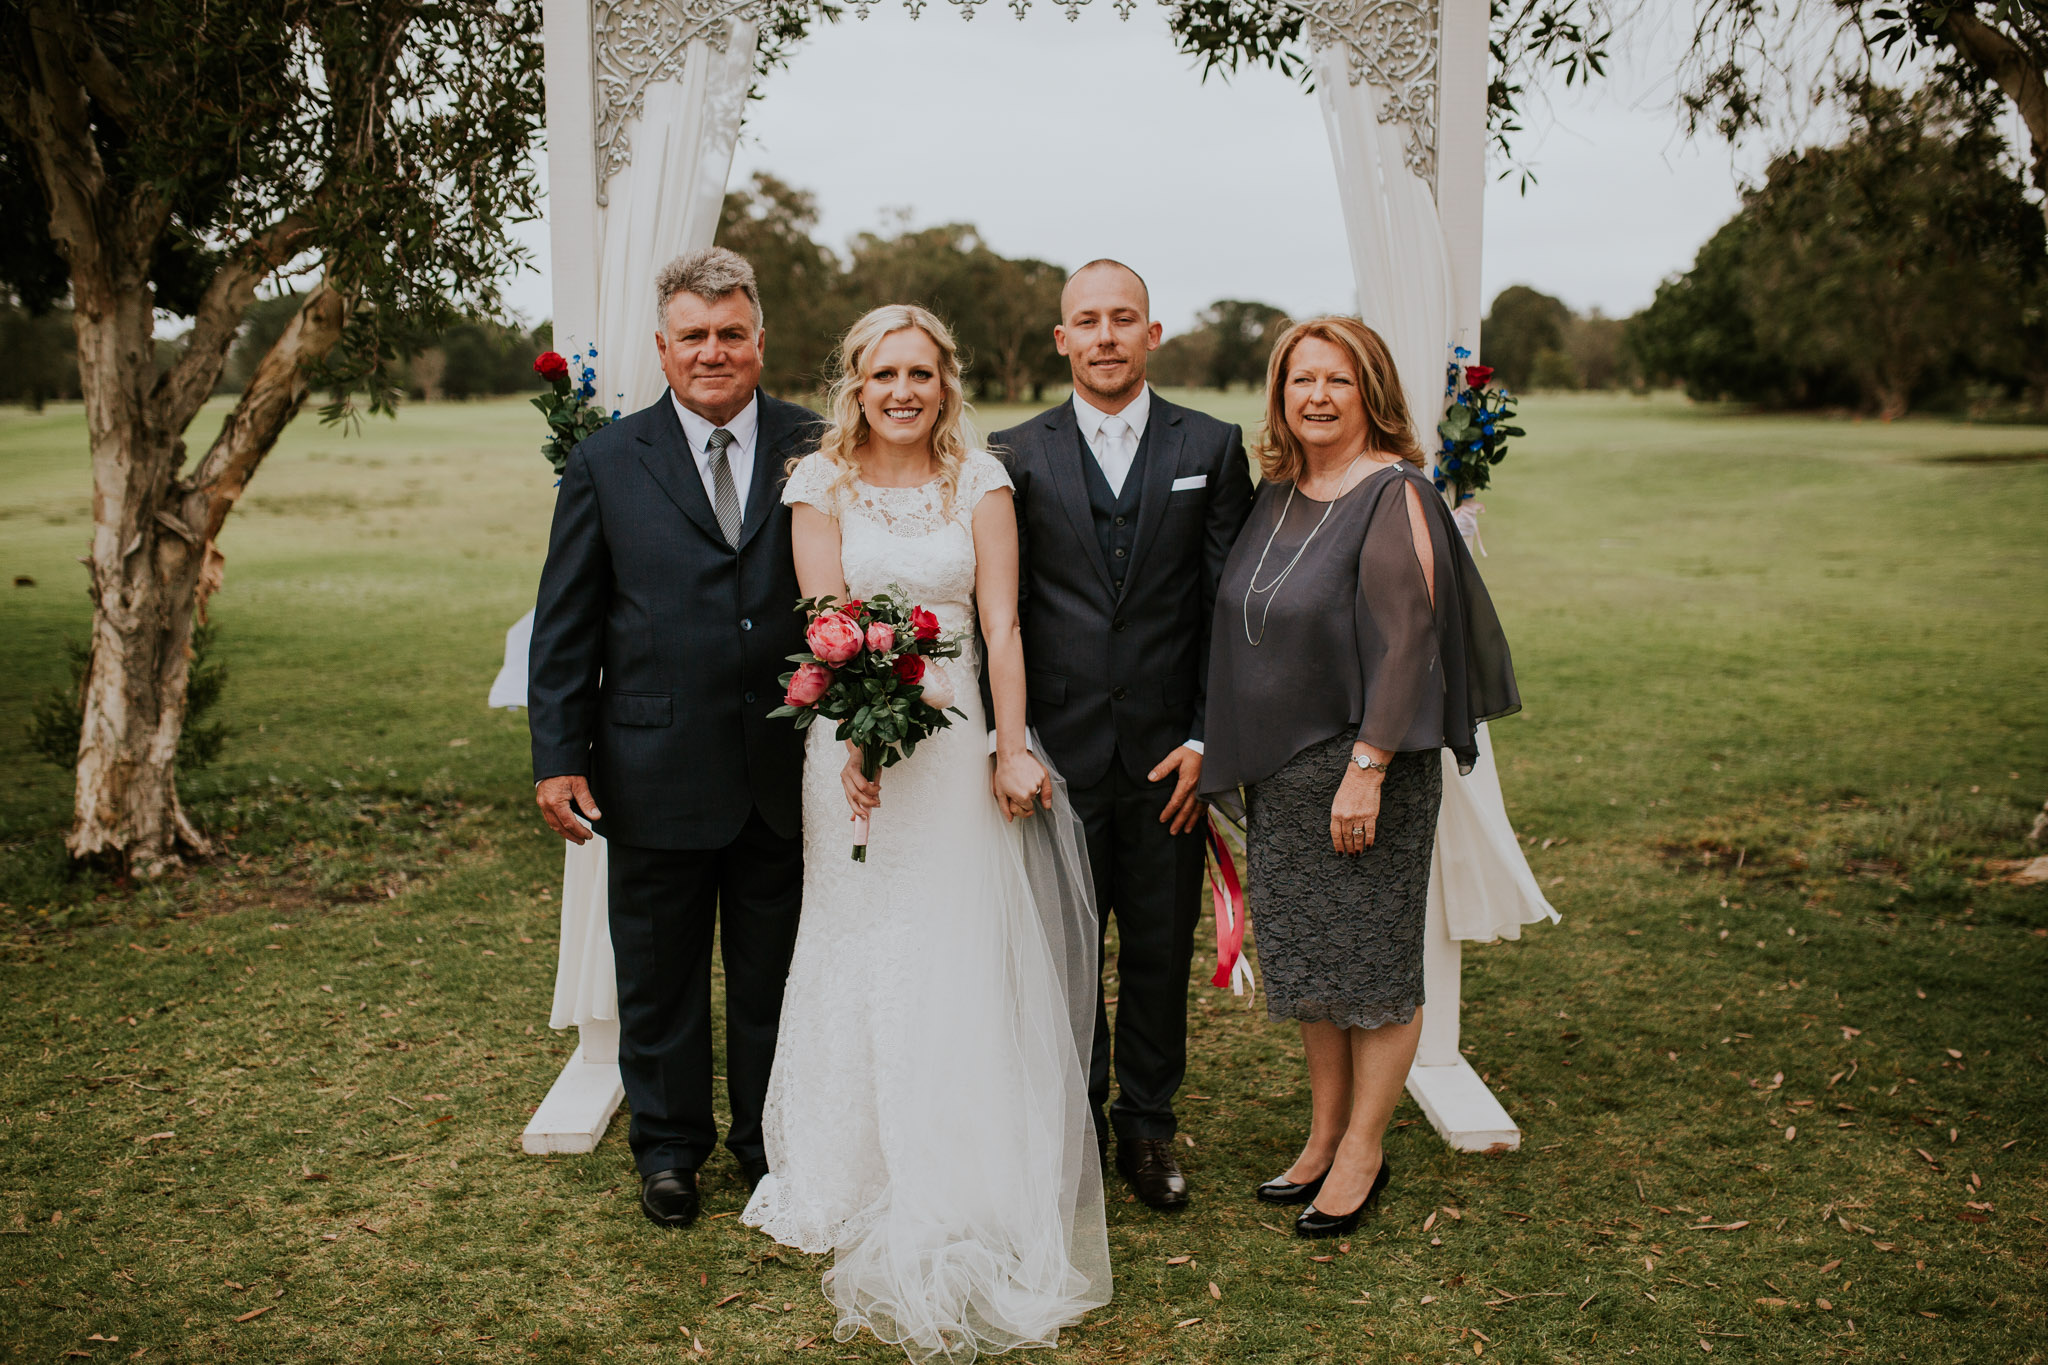 Shanan & Traci_Portkembla Golf Course Wedding-39.jpg